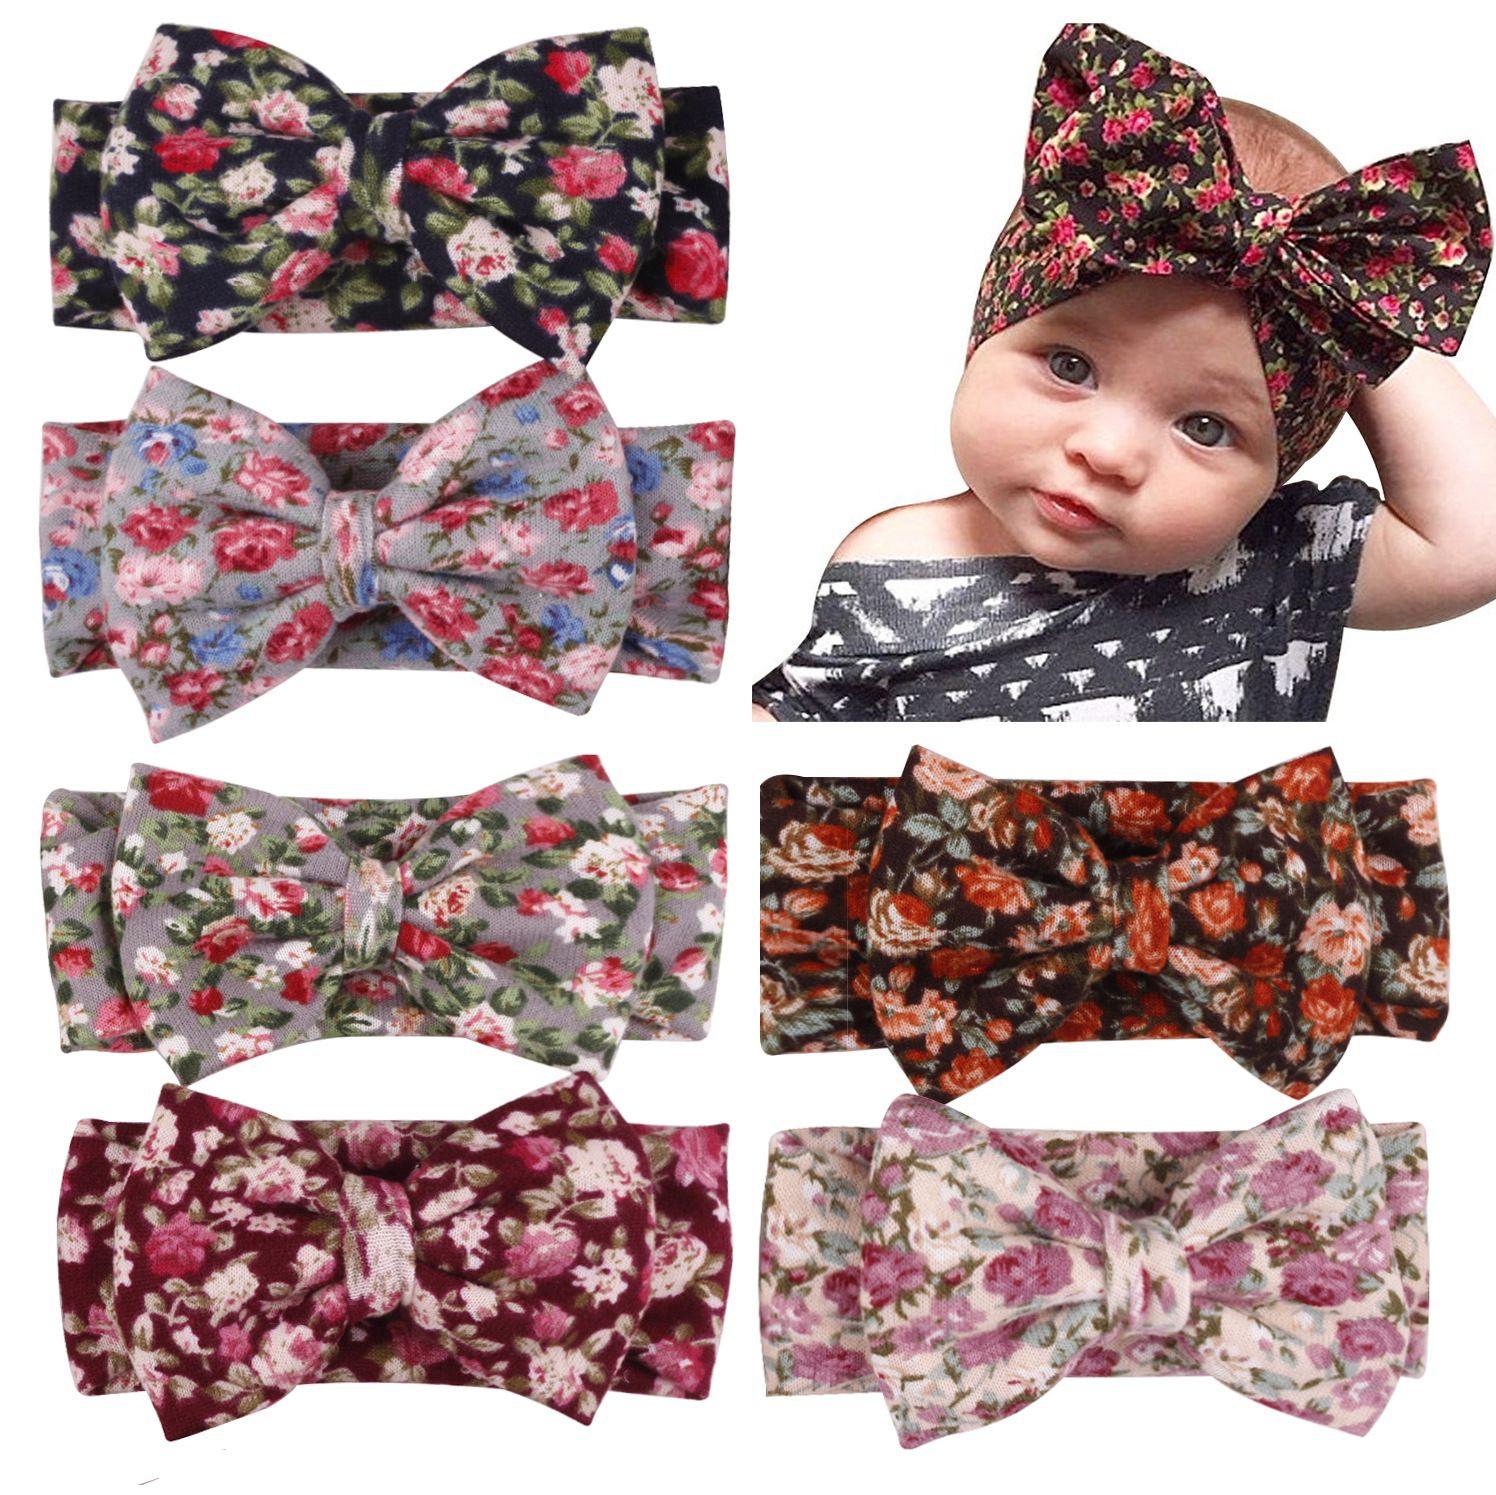 Headbands Bow hairs Vintge Hair Head Band Baby girl sweet Elastic knit cotton baby hair accessories Wholesale cheap 2017